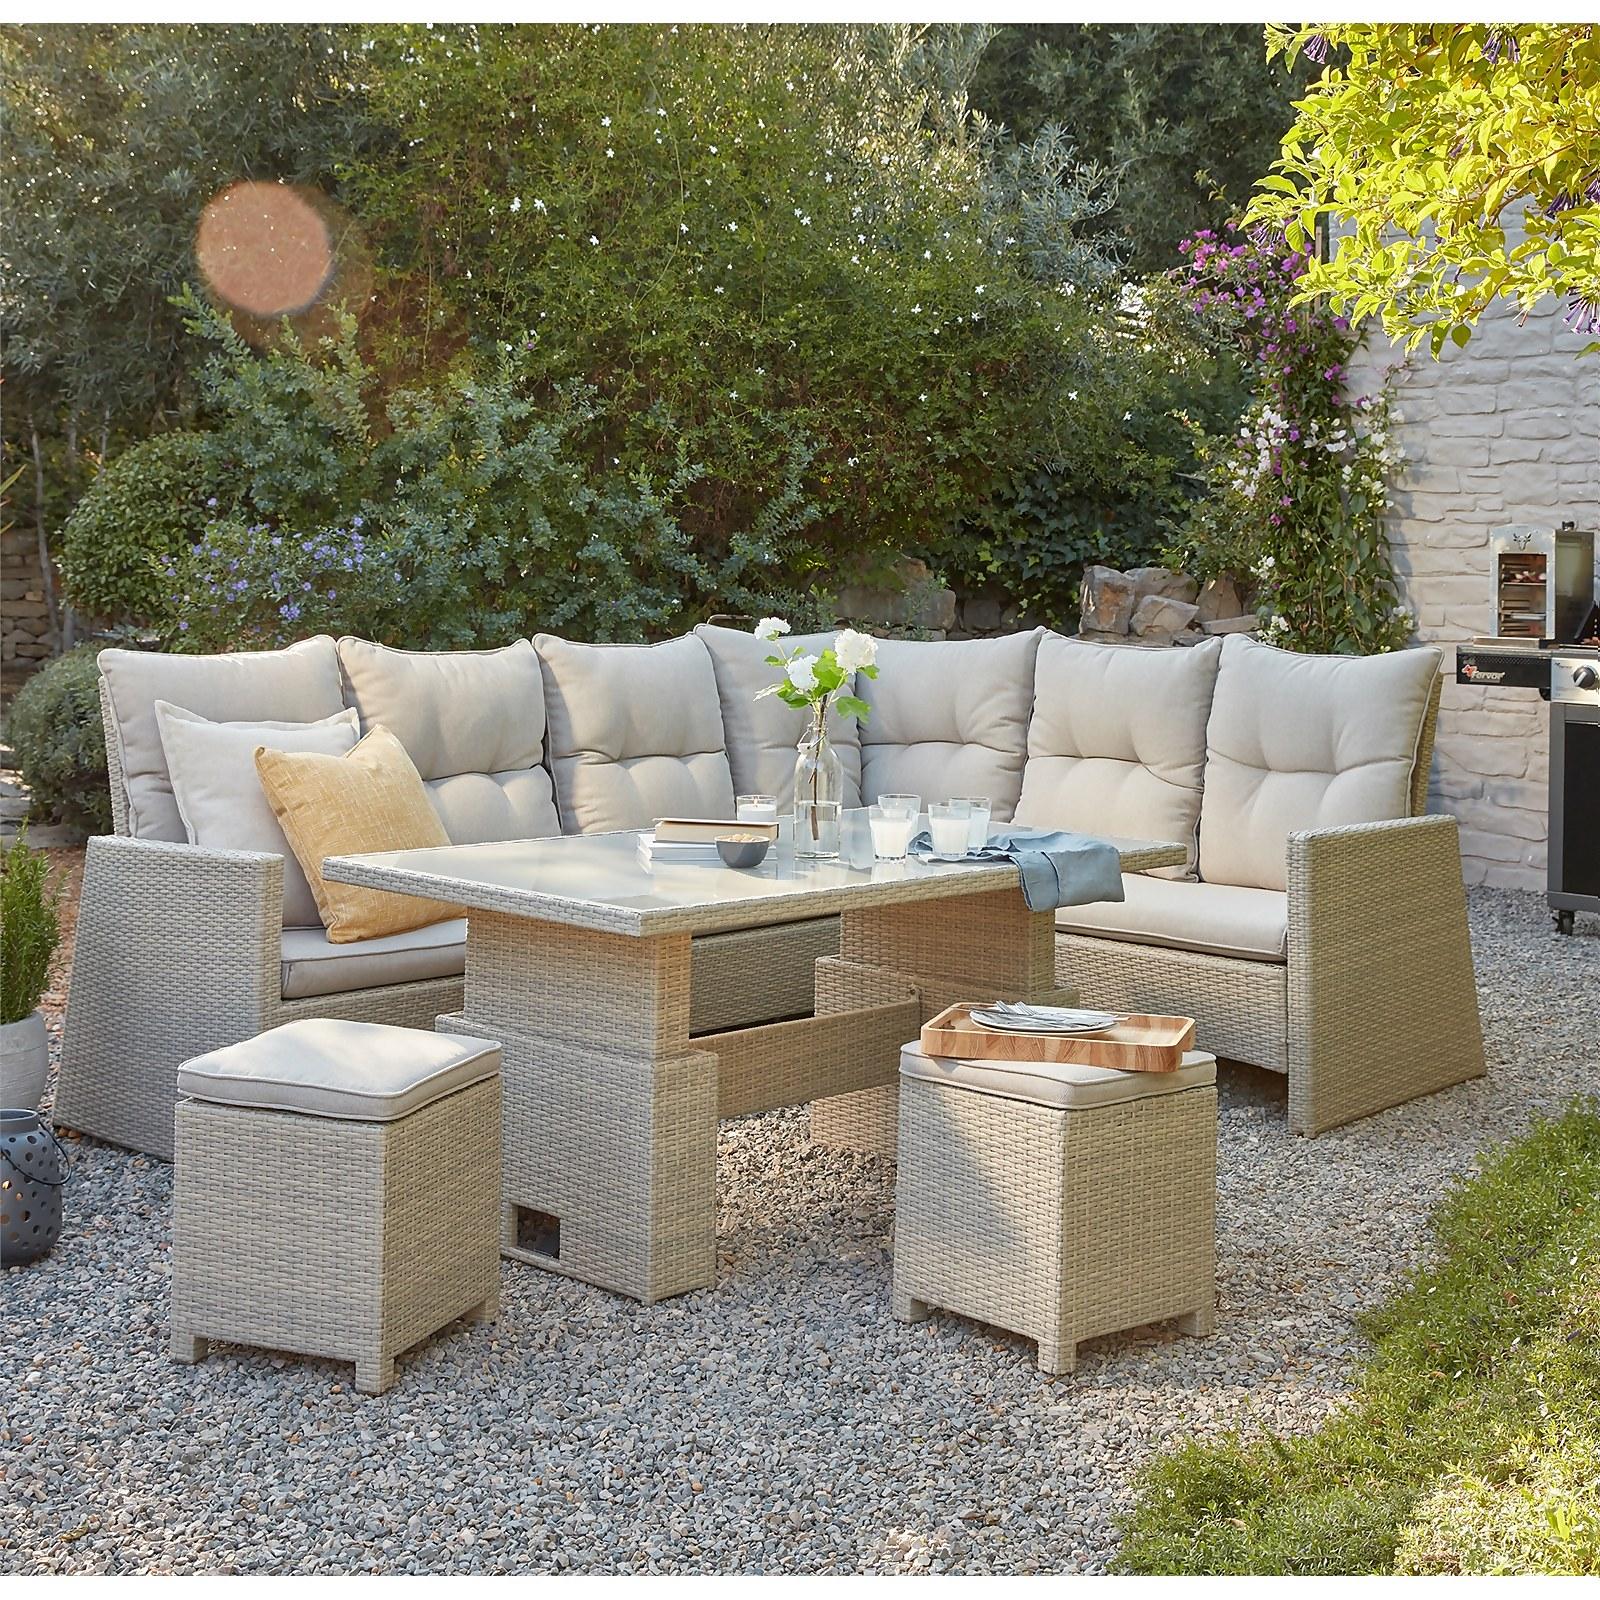 Hartington Rattan Albury Rising Corner Dining Sofa Set - Natural